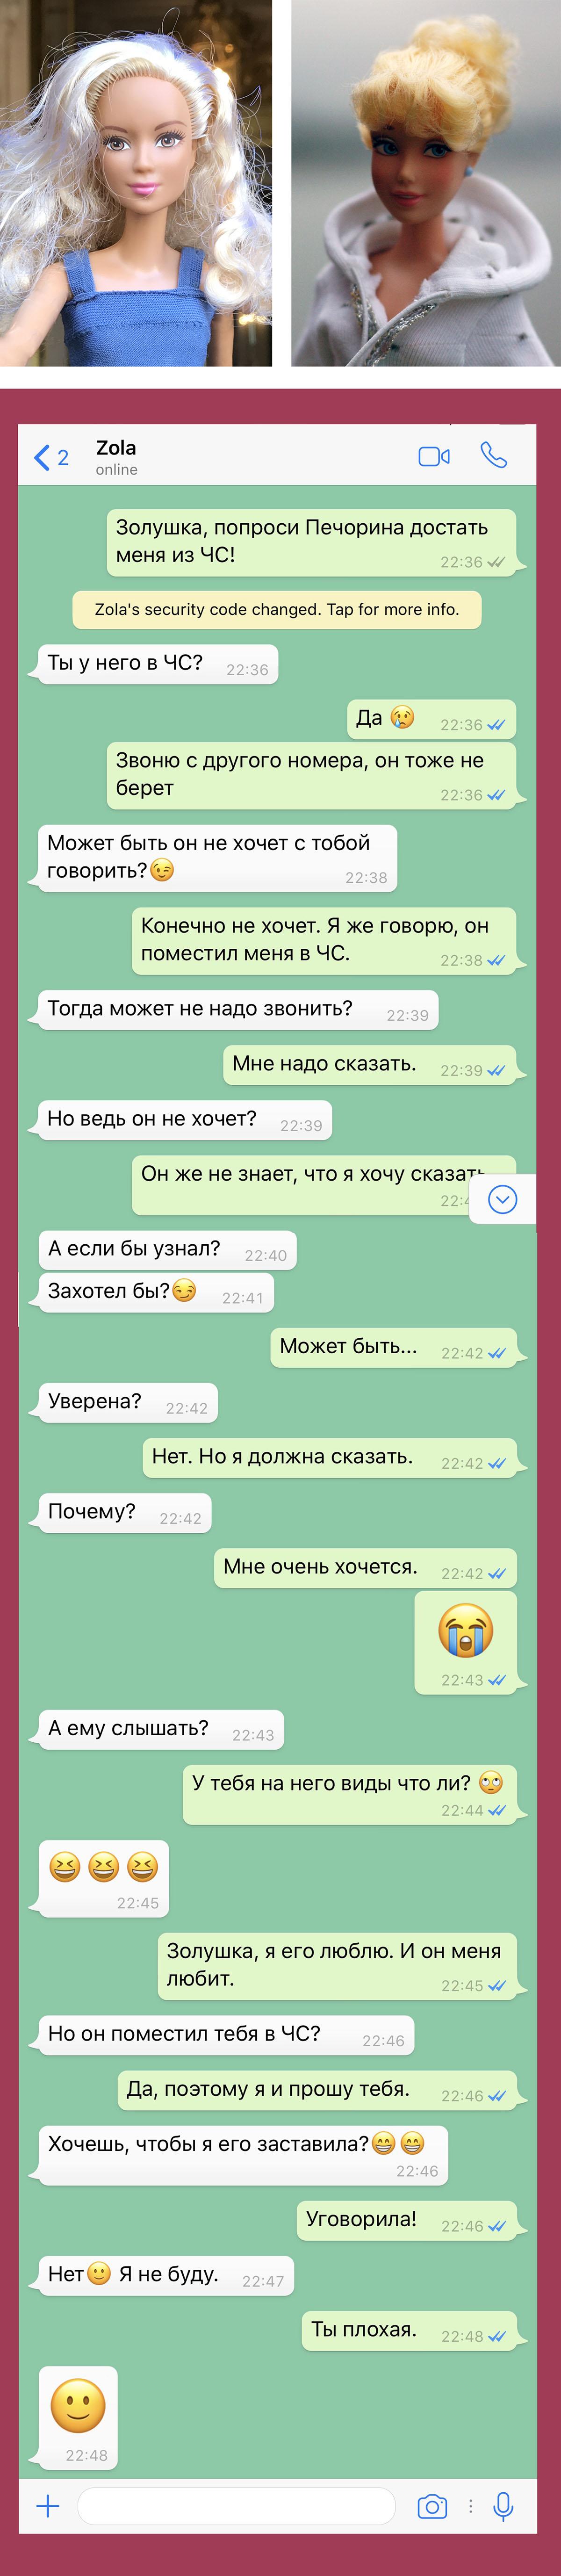 WhatsApp Белладонна – Золушка